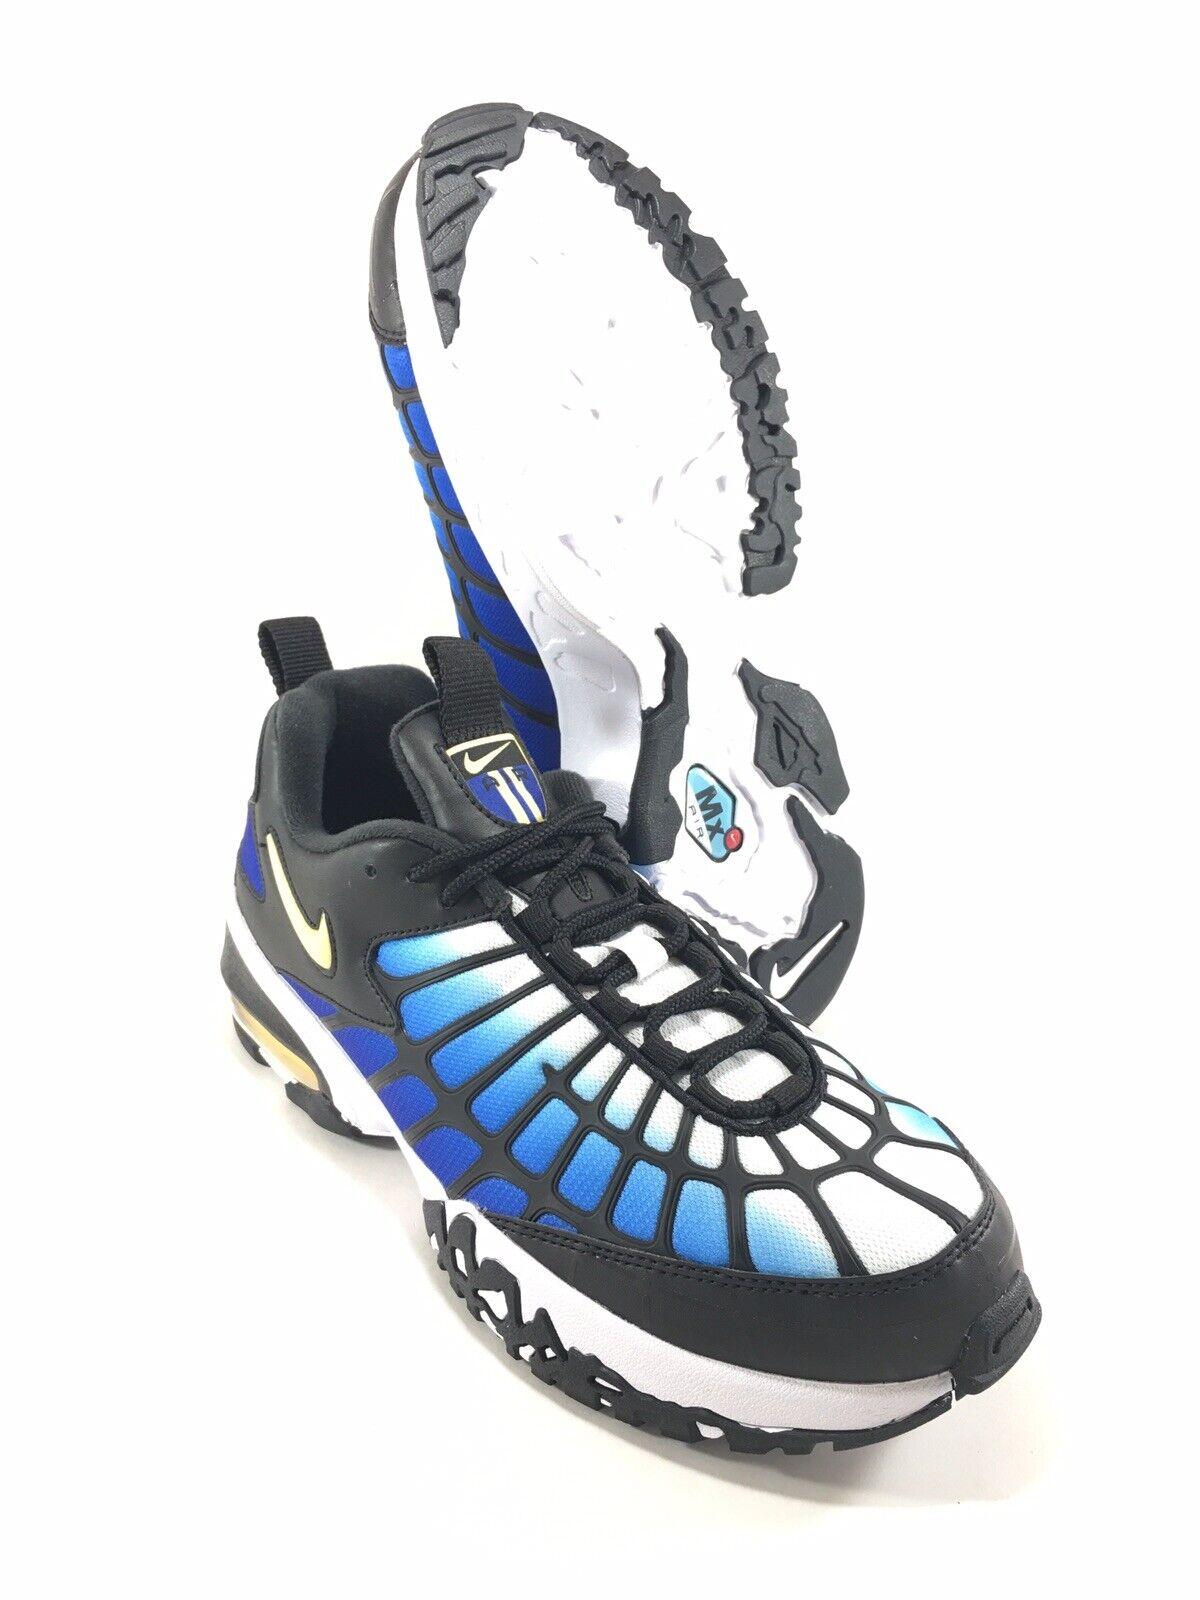 Nike Air Max 120 2015 Hyper bluee Chamois Black White 819857 400 Mens Size 9 New